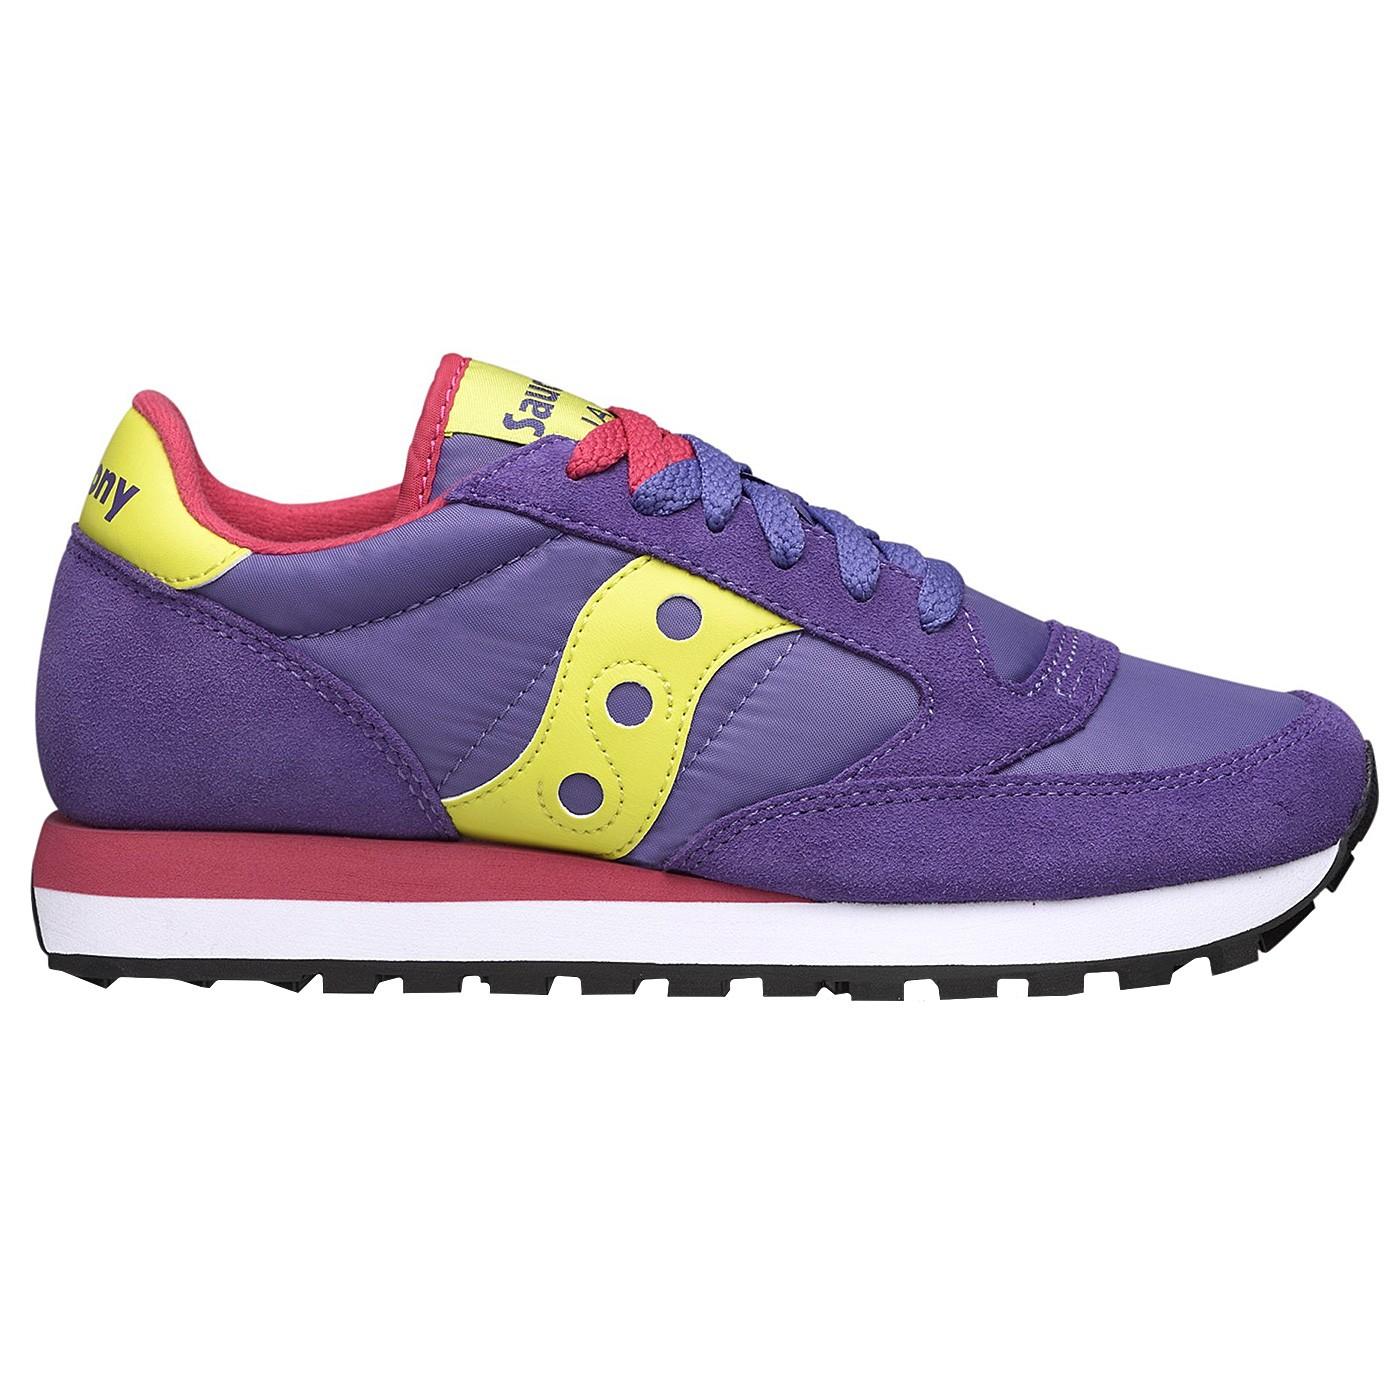 Sneakers Saucony Jazz Original Woman purple lime fuchsia